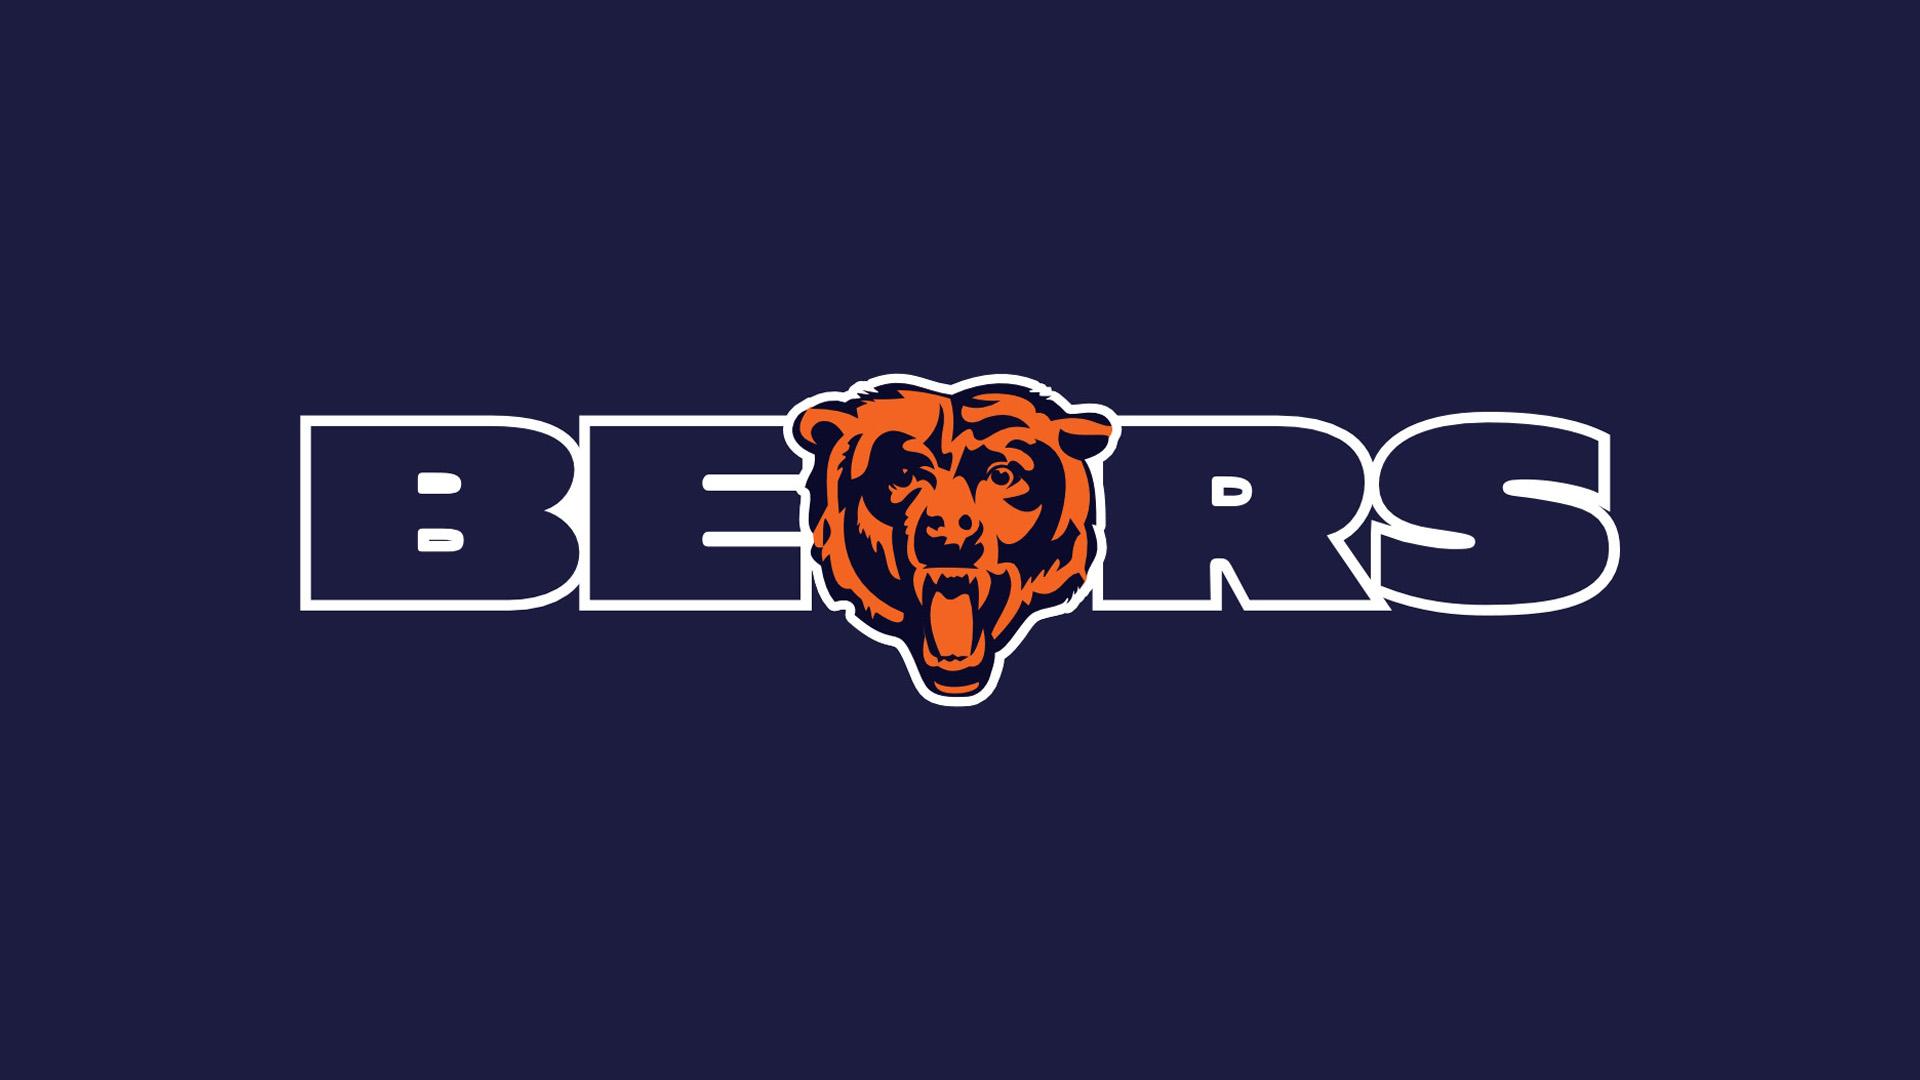 CHICAGO BEARS nfl football wallpaper 1920x1080 156202 1920x1080